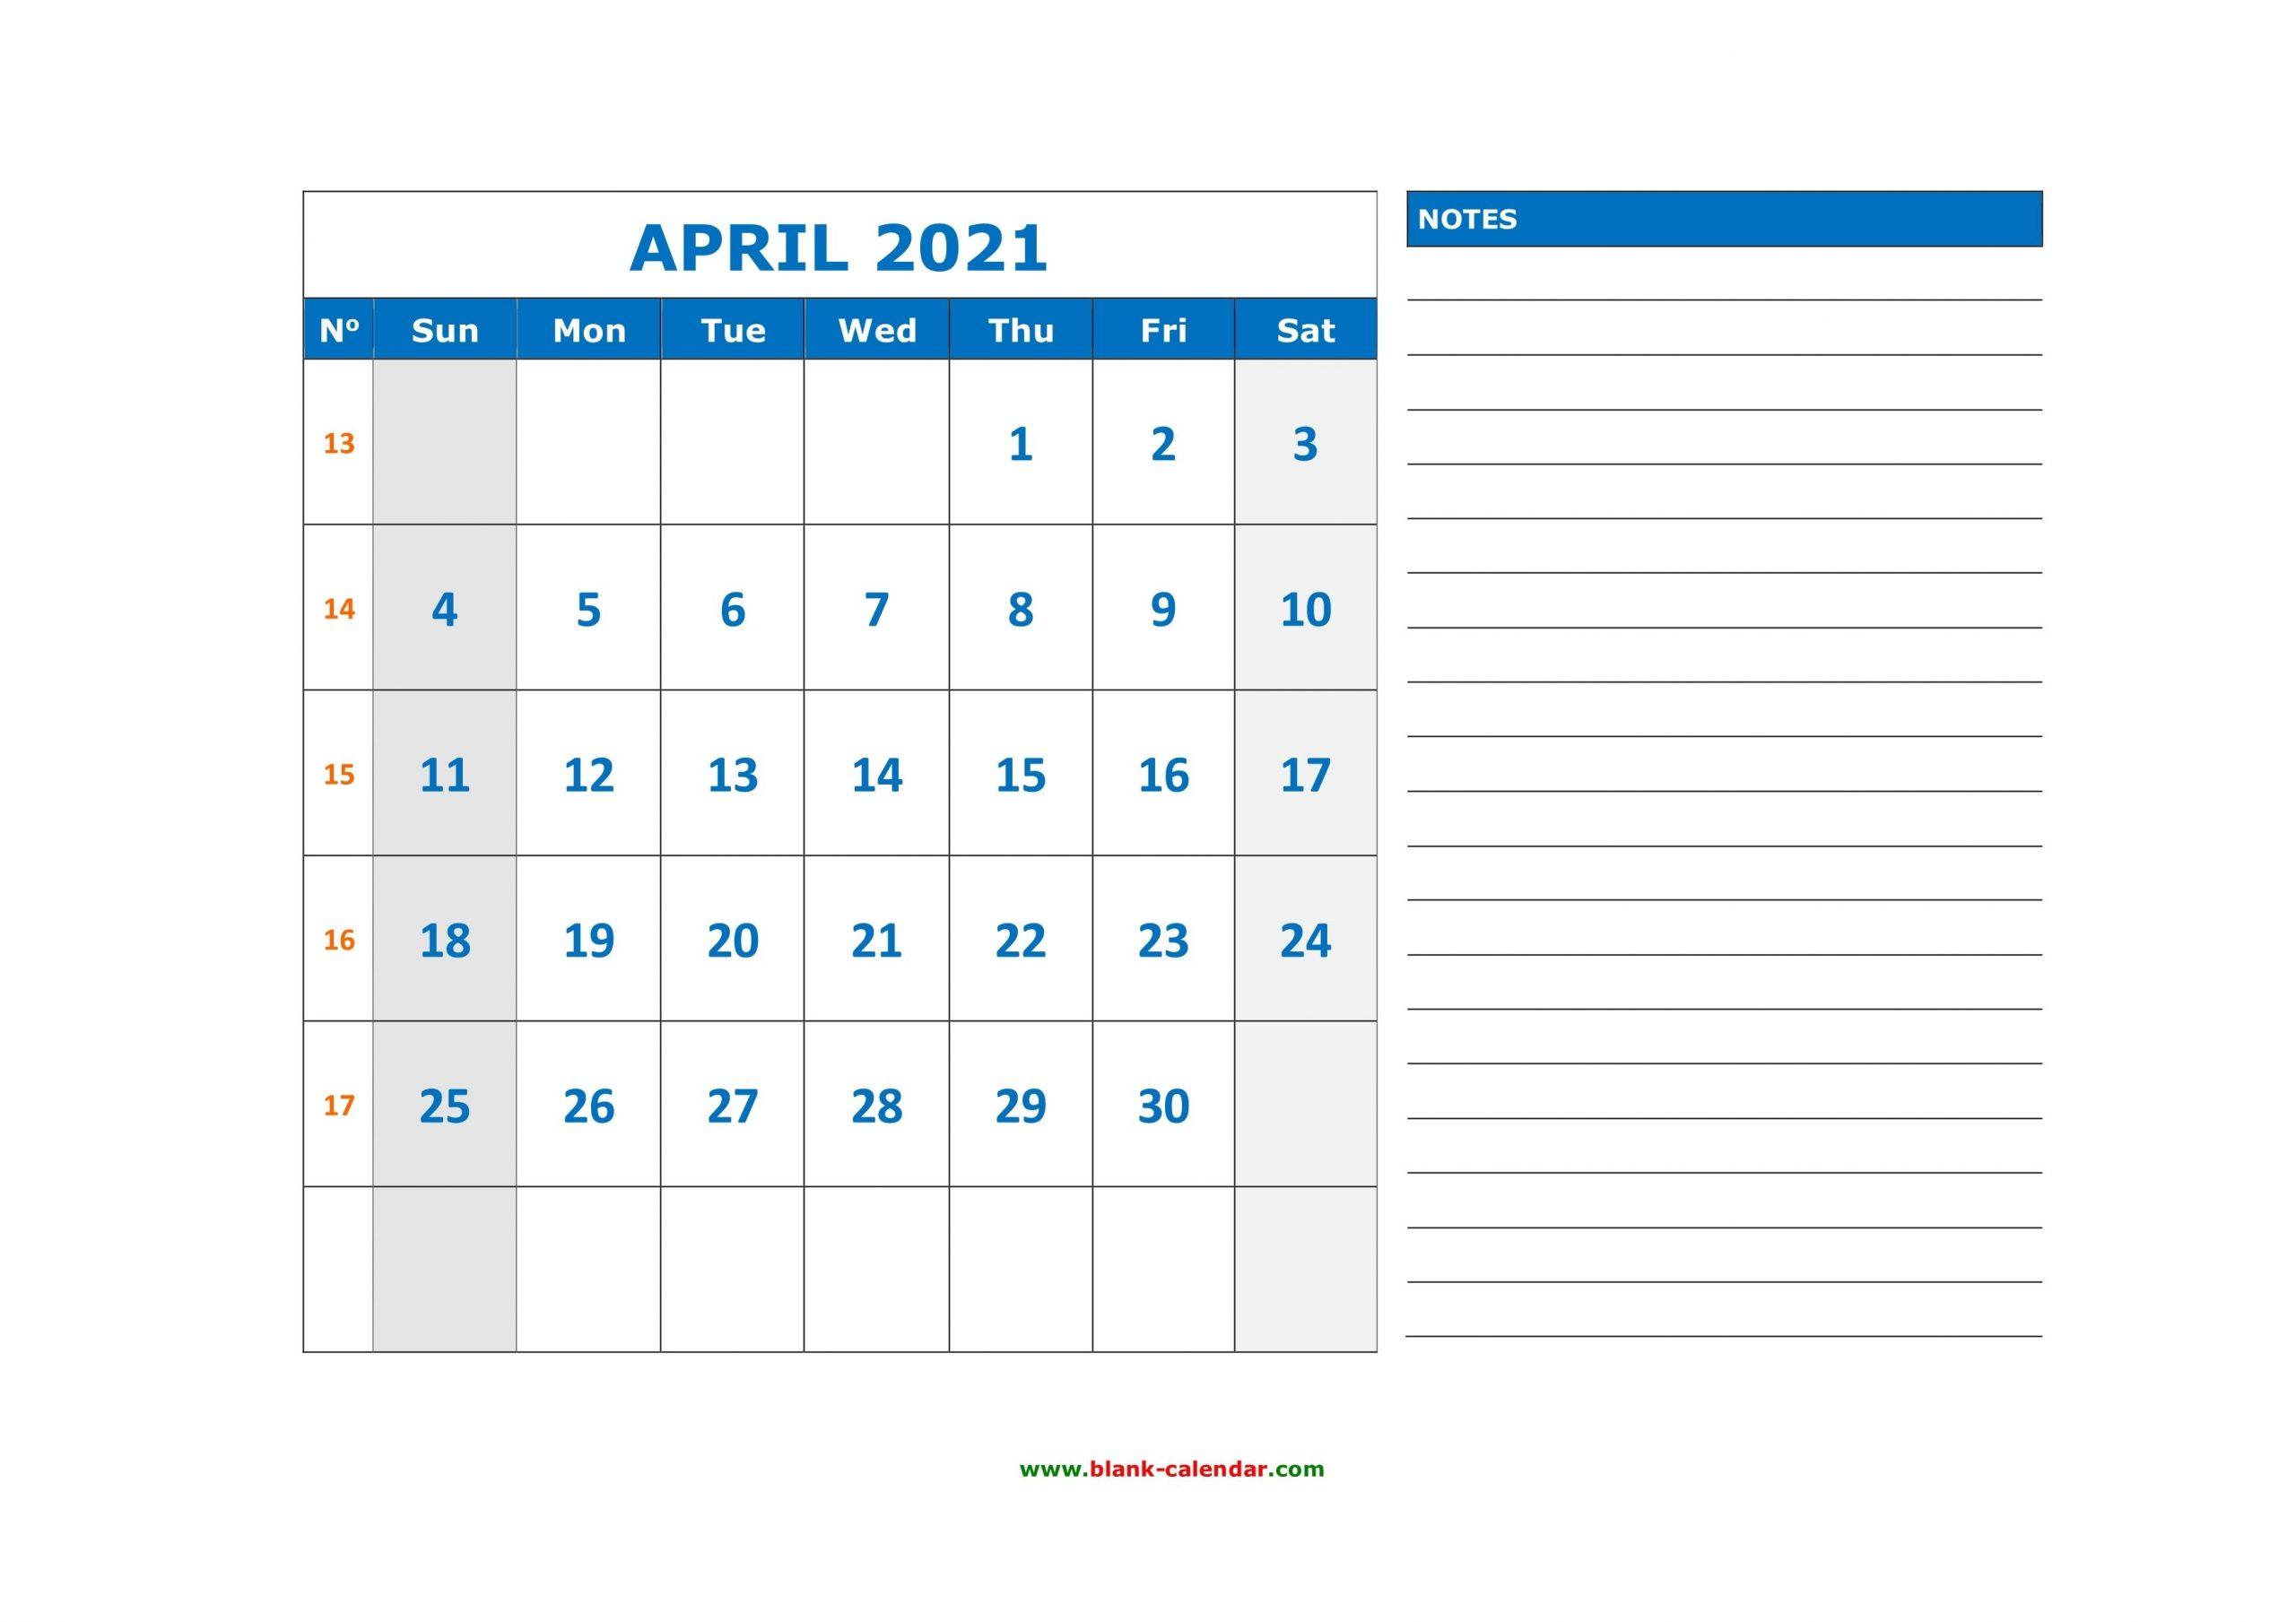 Free Download Printable April 2021 Calendar, Large Space